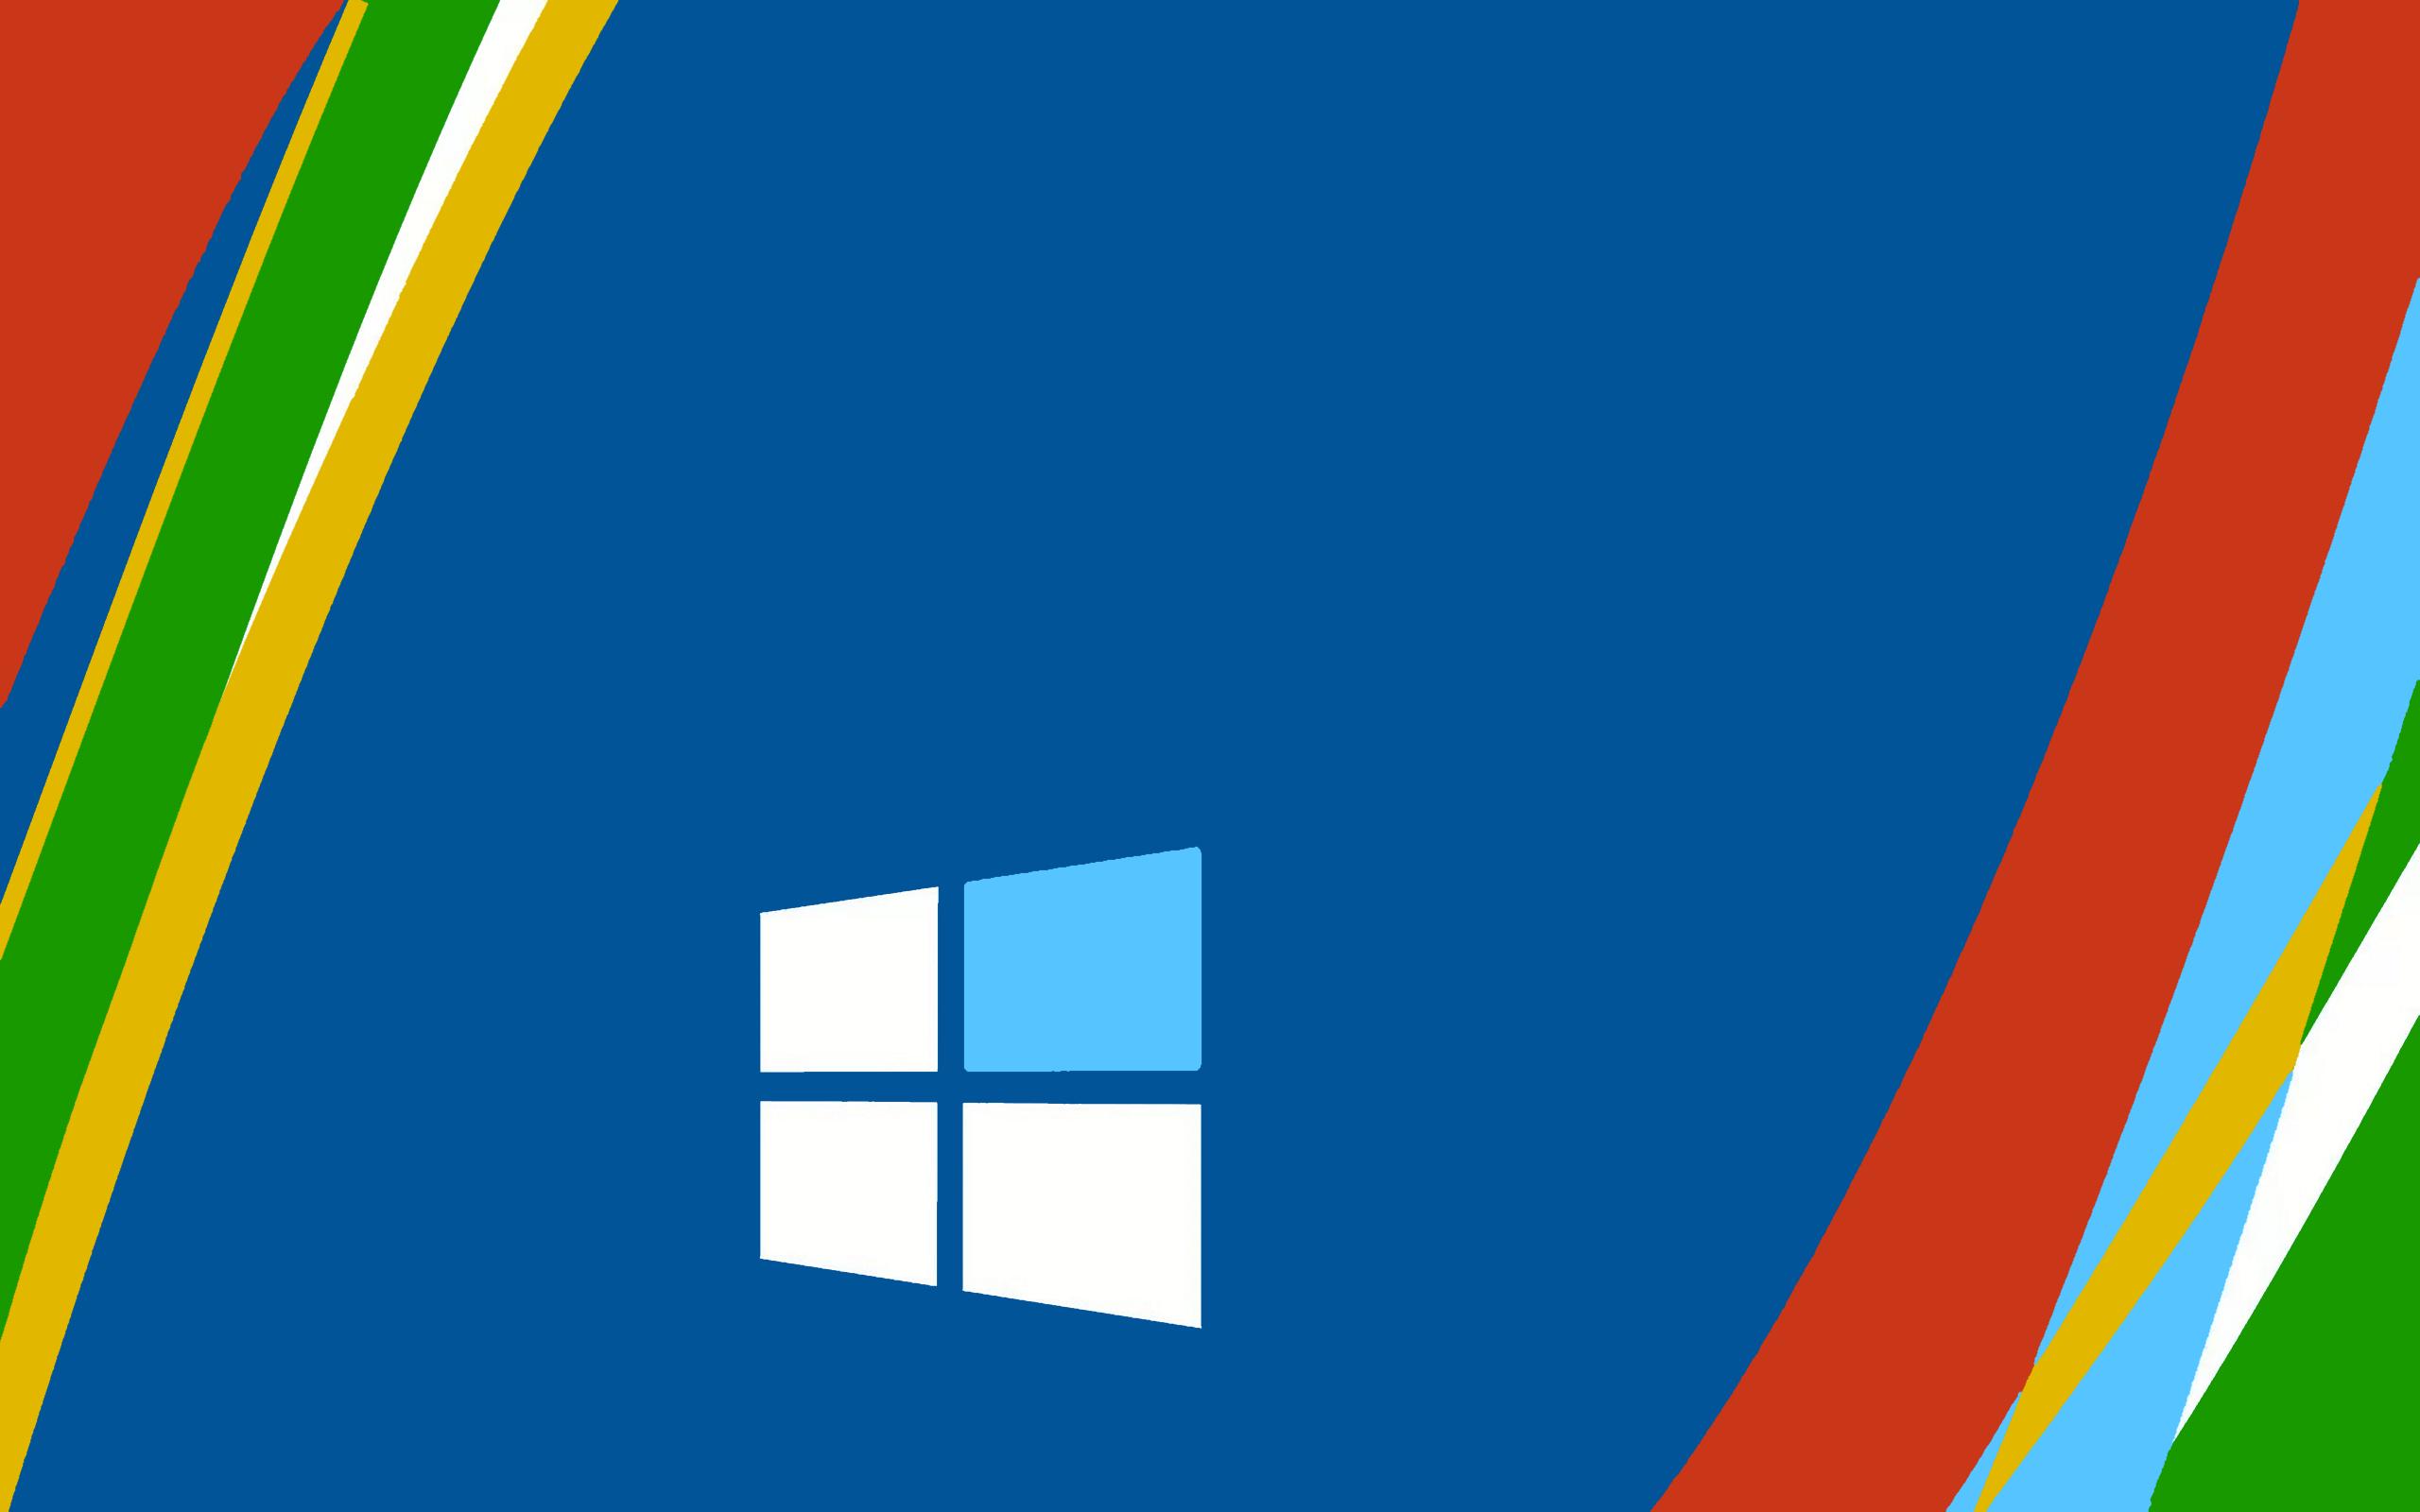 Windows 10 Wallpapers Archives HDWallSource HDWallSource